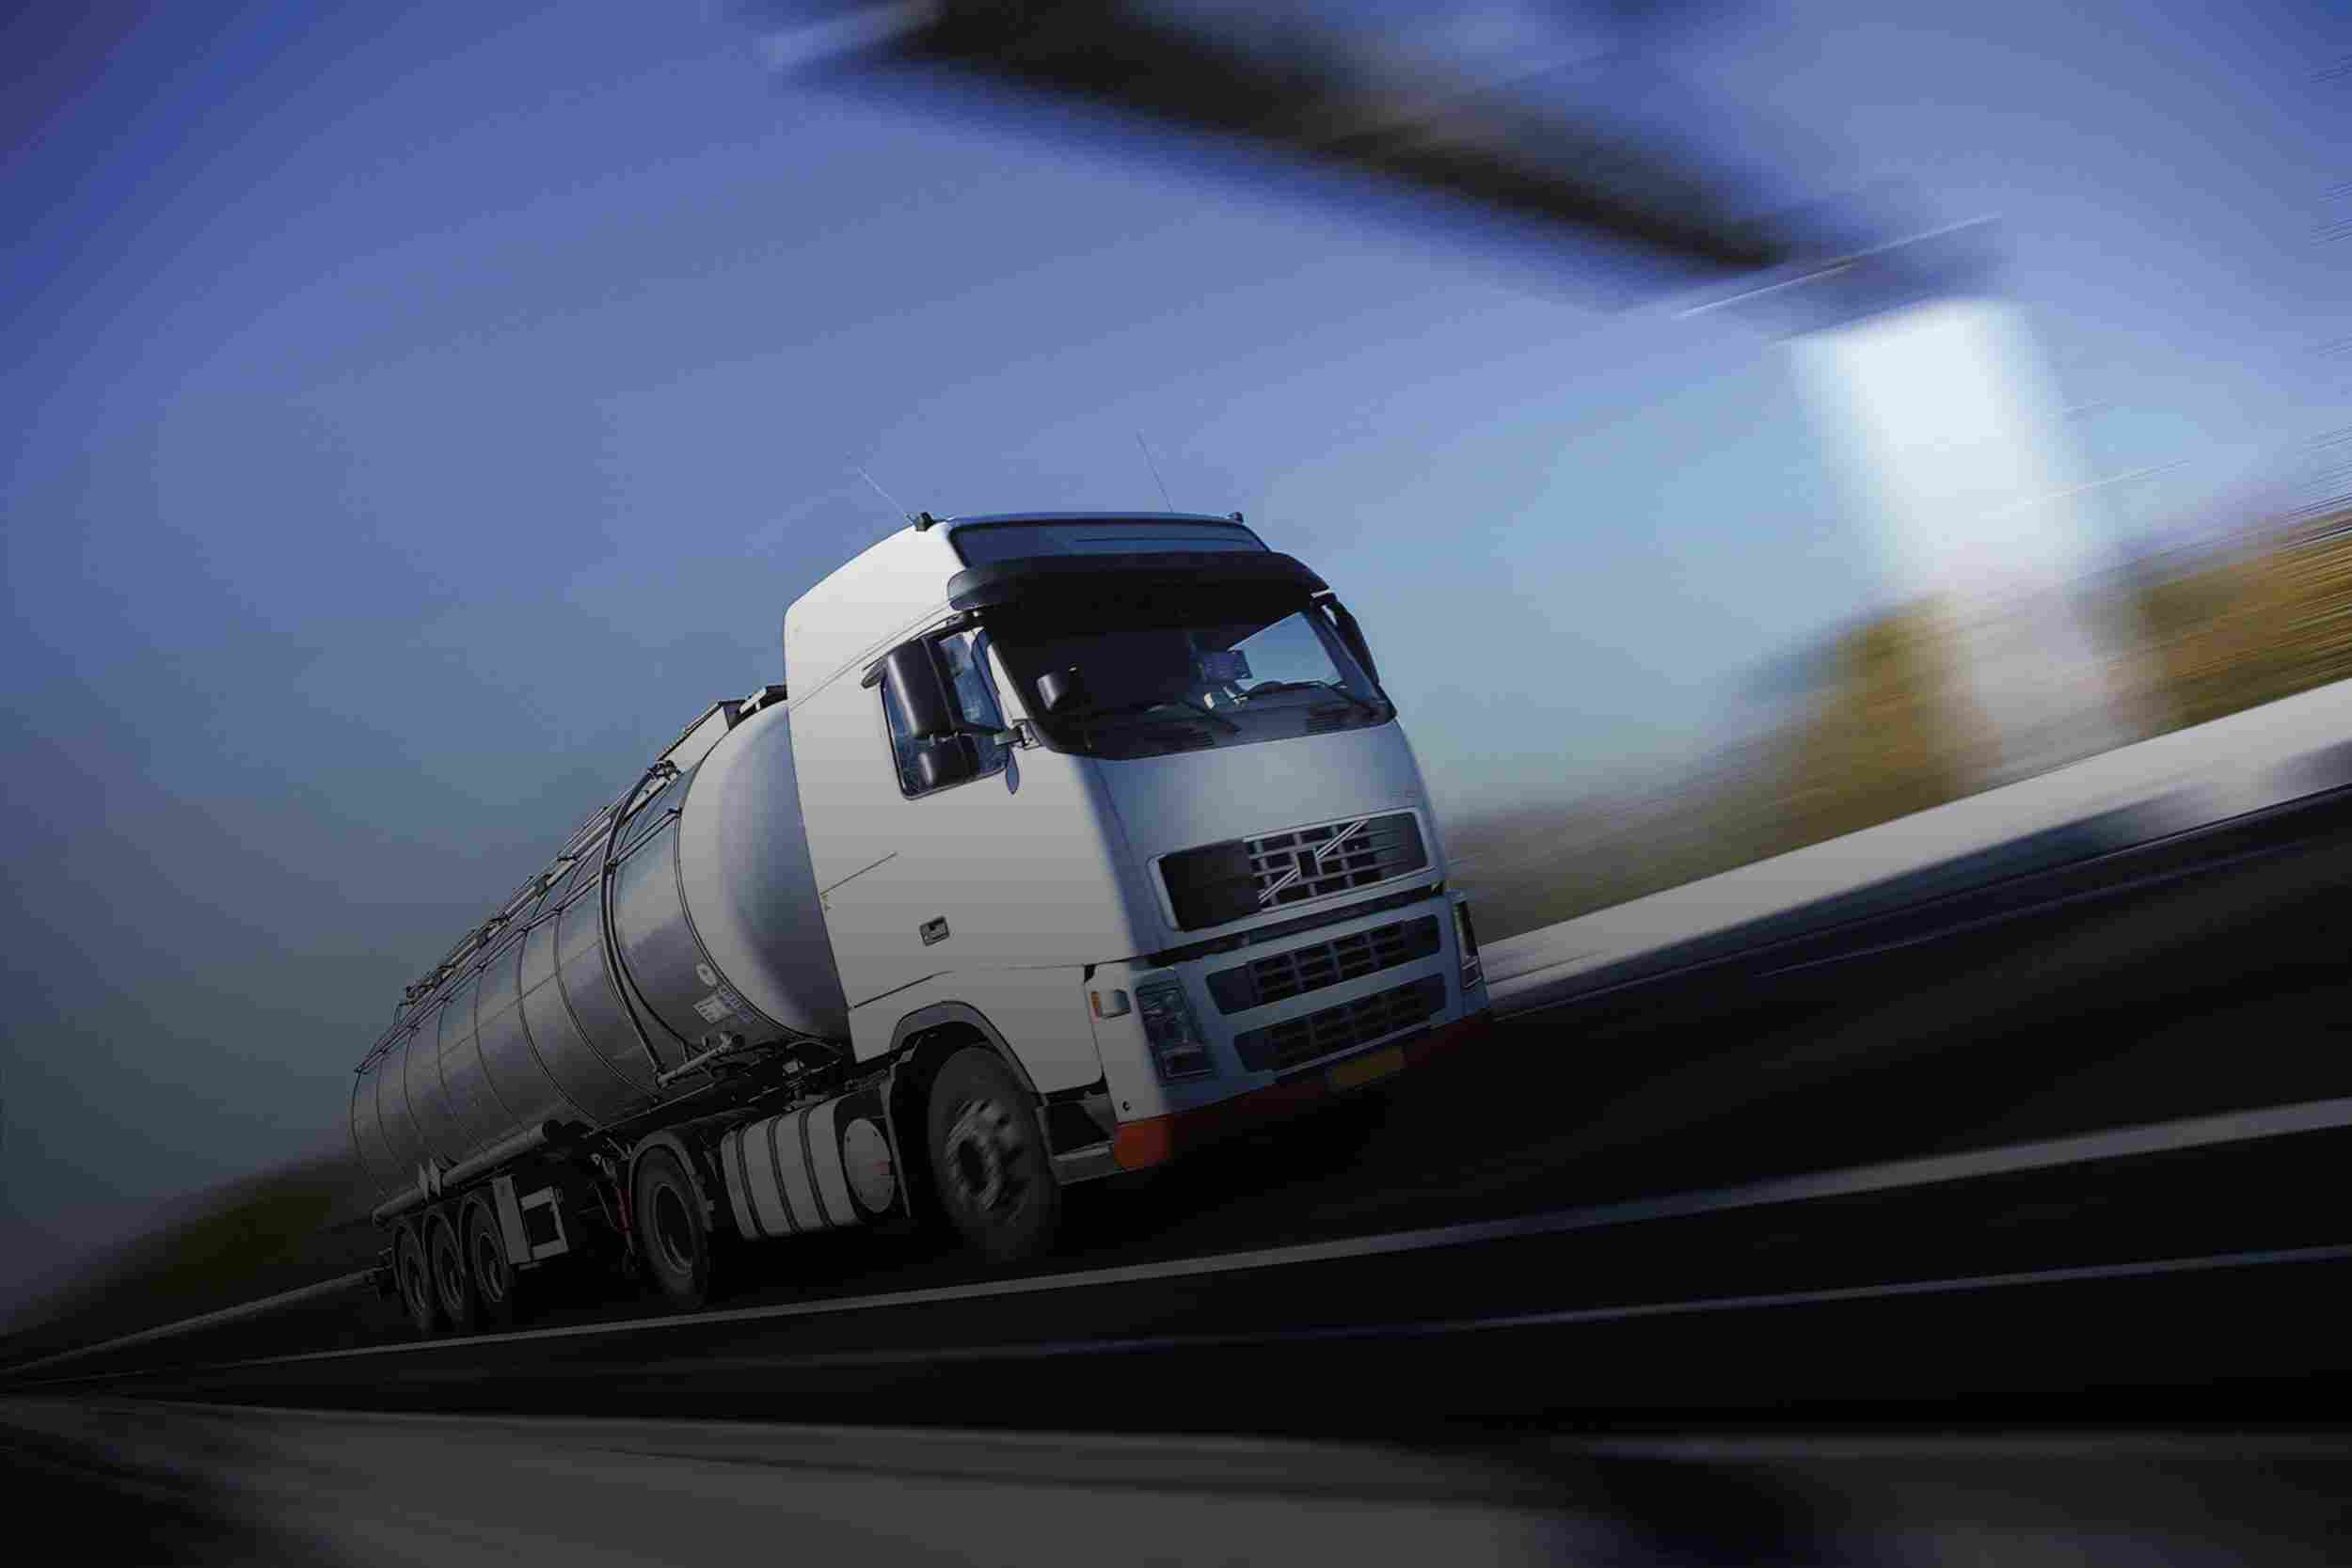 https://www.aerodarat.com/wp-content/uploads/2015/09/White-Truck-single.jpg